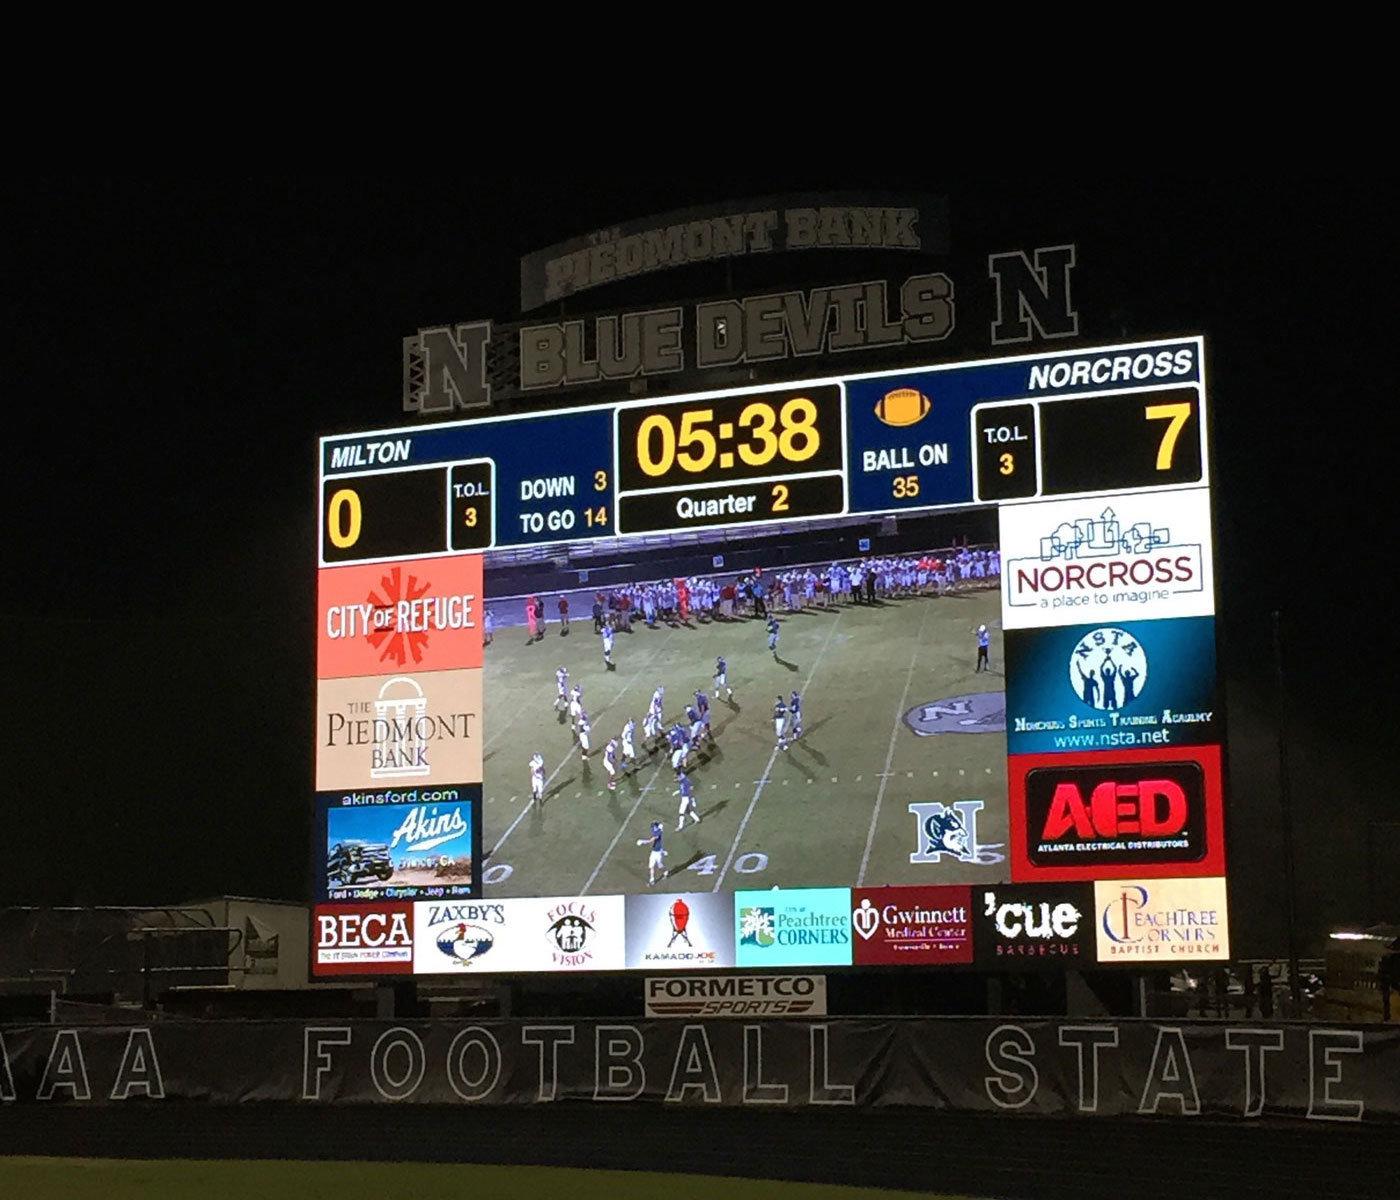 ProPresenter Scoreboard software at Norcross High School